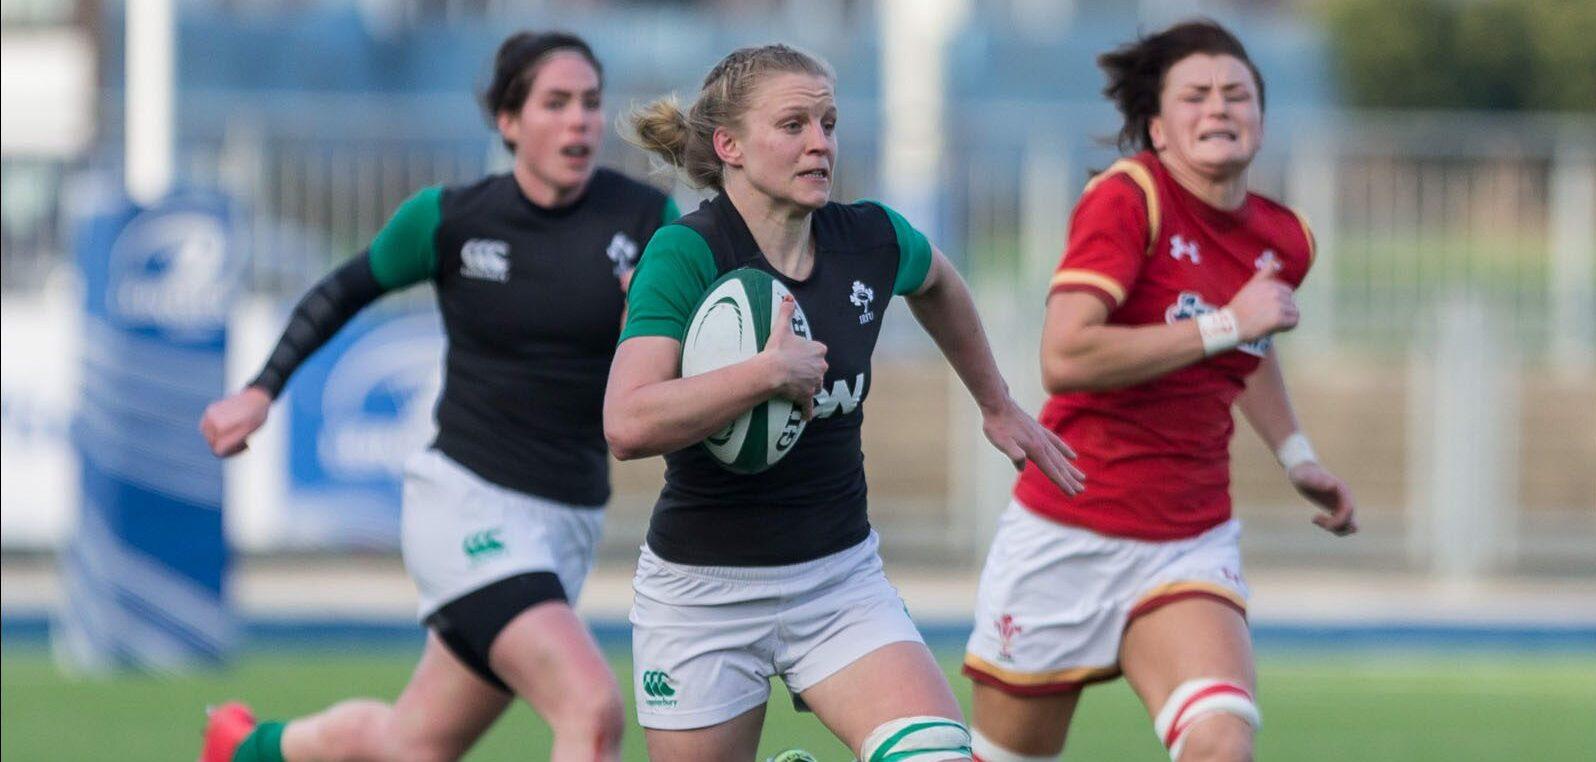 WRWC2017: Molloy to captain Ireland